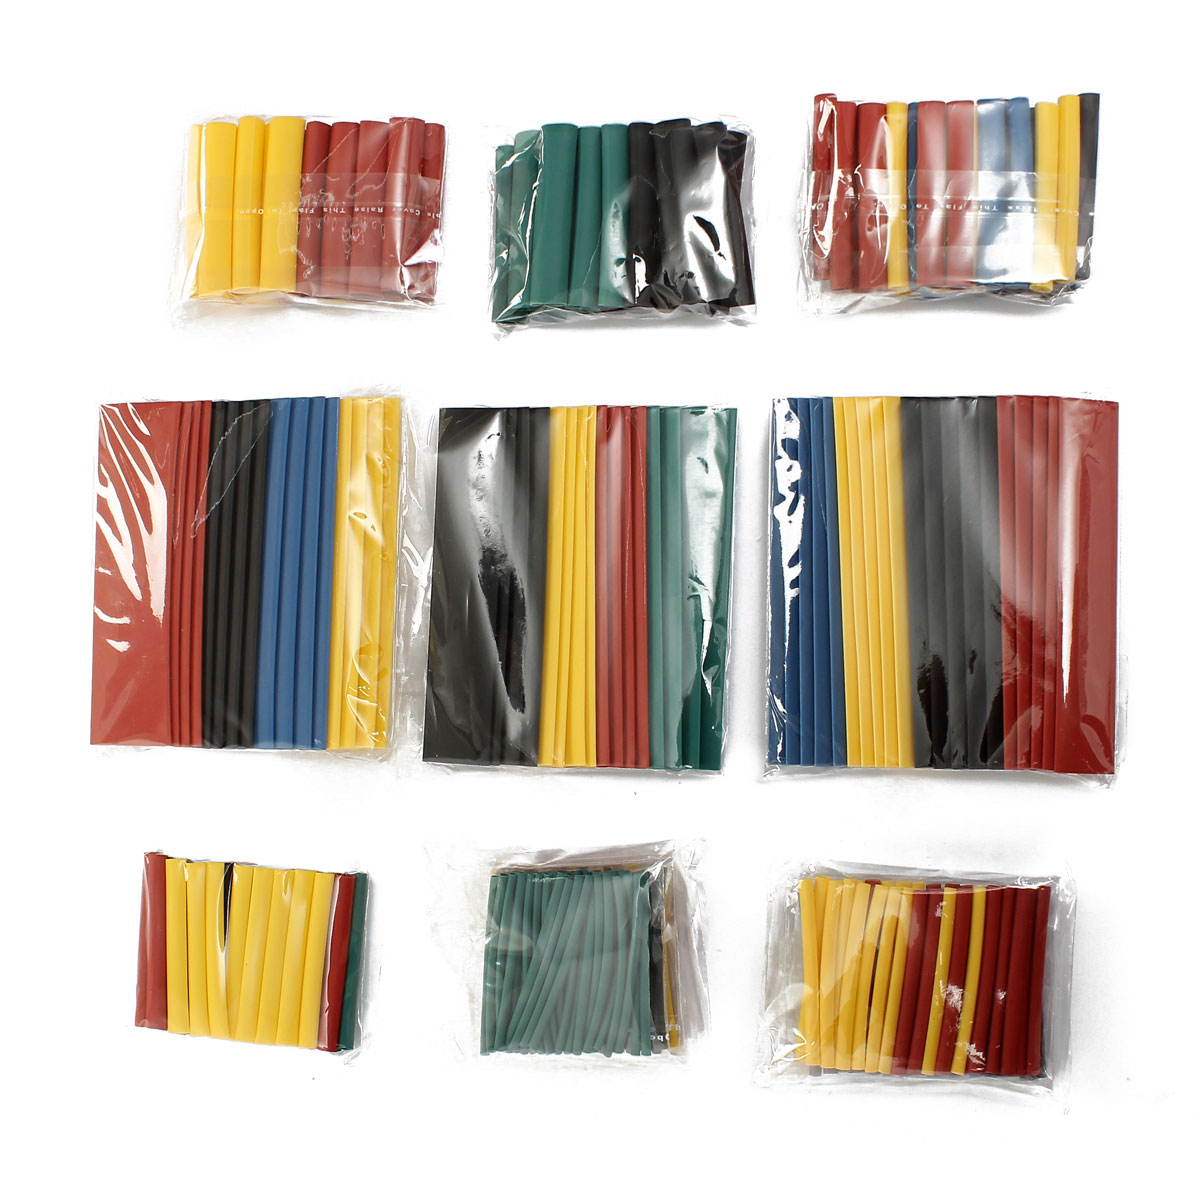 656Pcs 8 Sizes Multi Color Polyolefin 2:1 Halogen-Free Heat Shrink Tube Assortment Sleeving Wrap Wire Kit Tubes New Wholesale